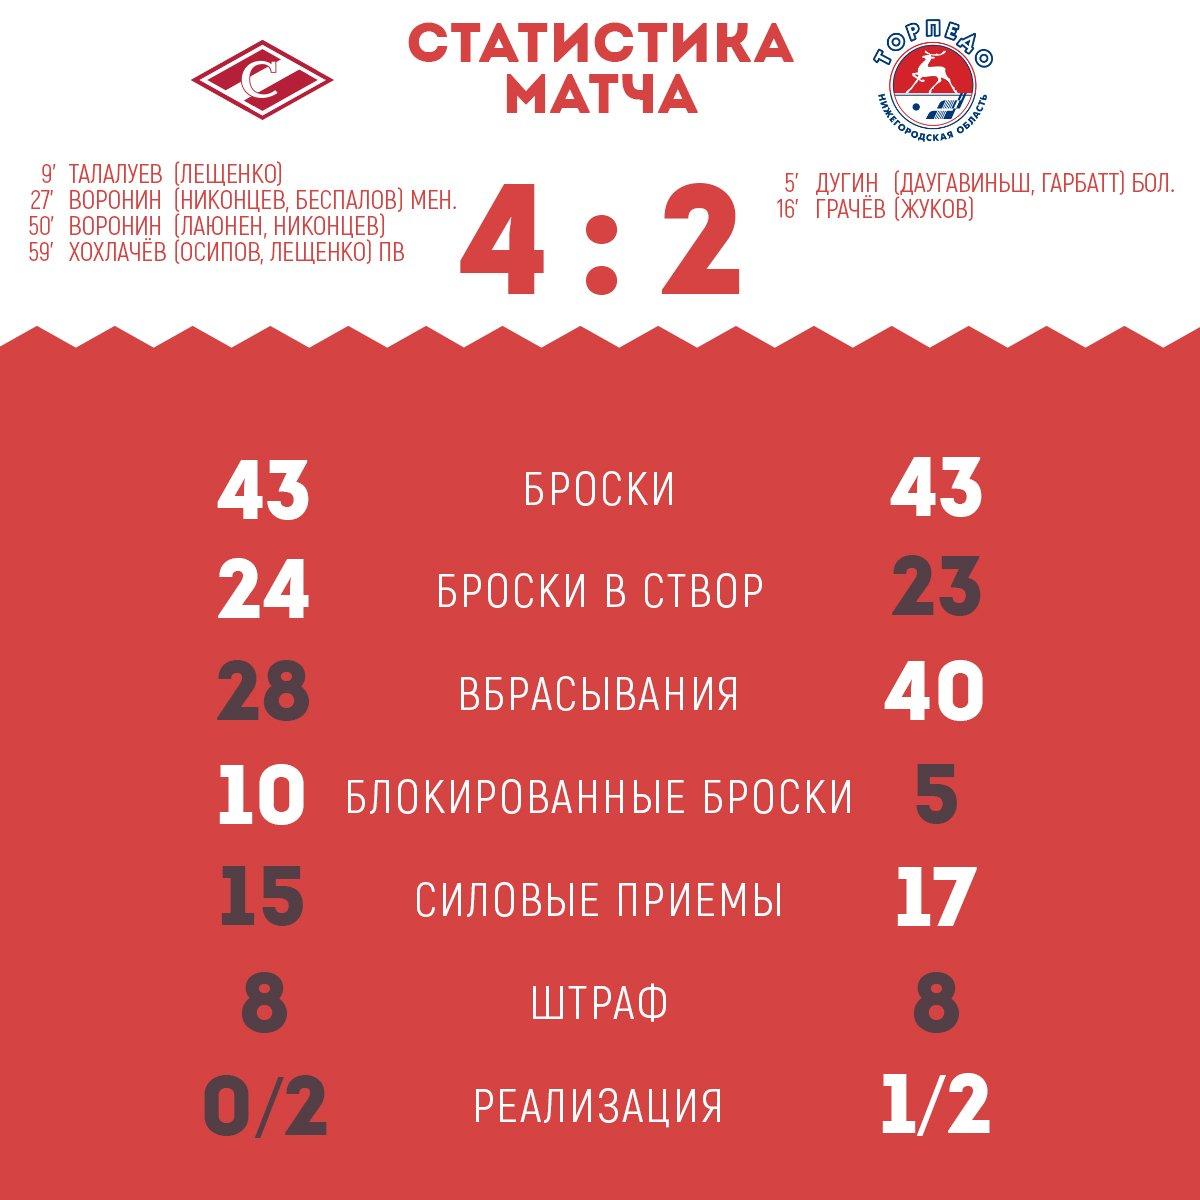 Статистика матча «Спартак» - «Торпедо» 4:2